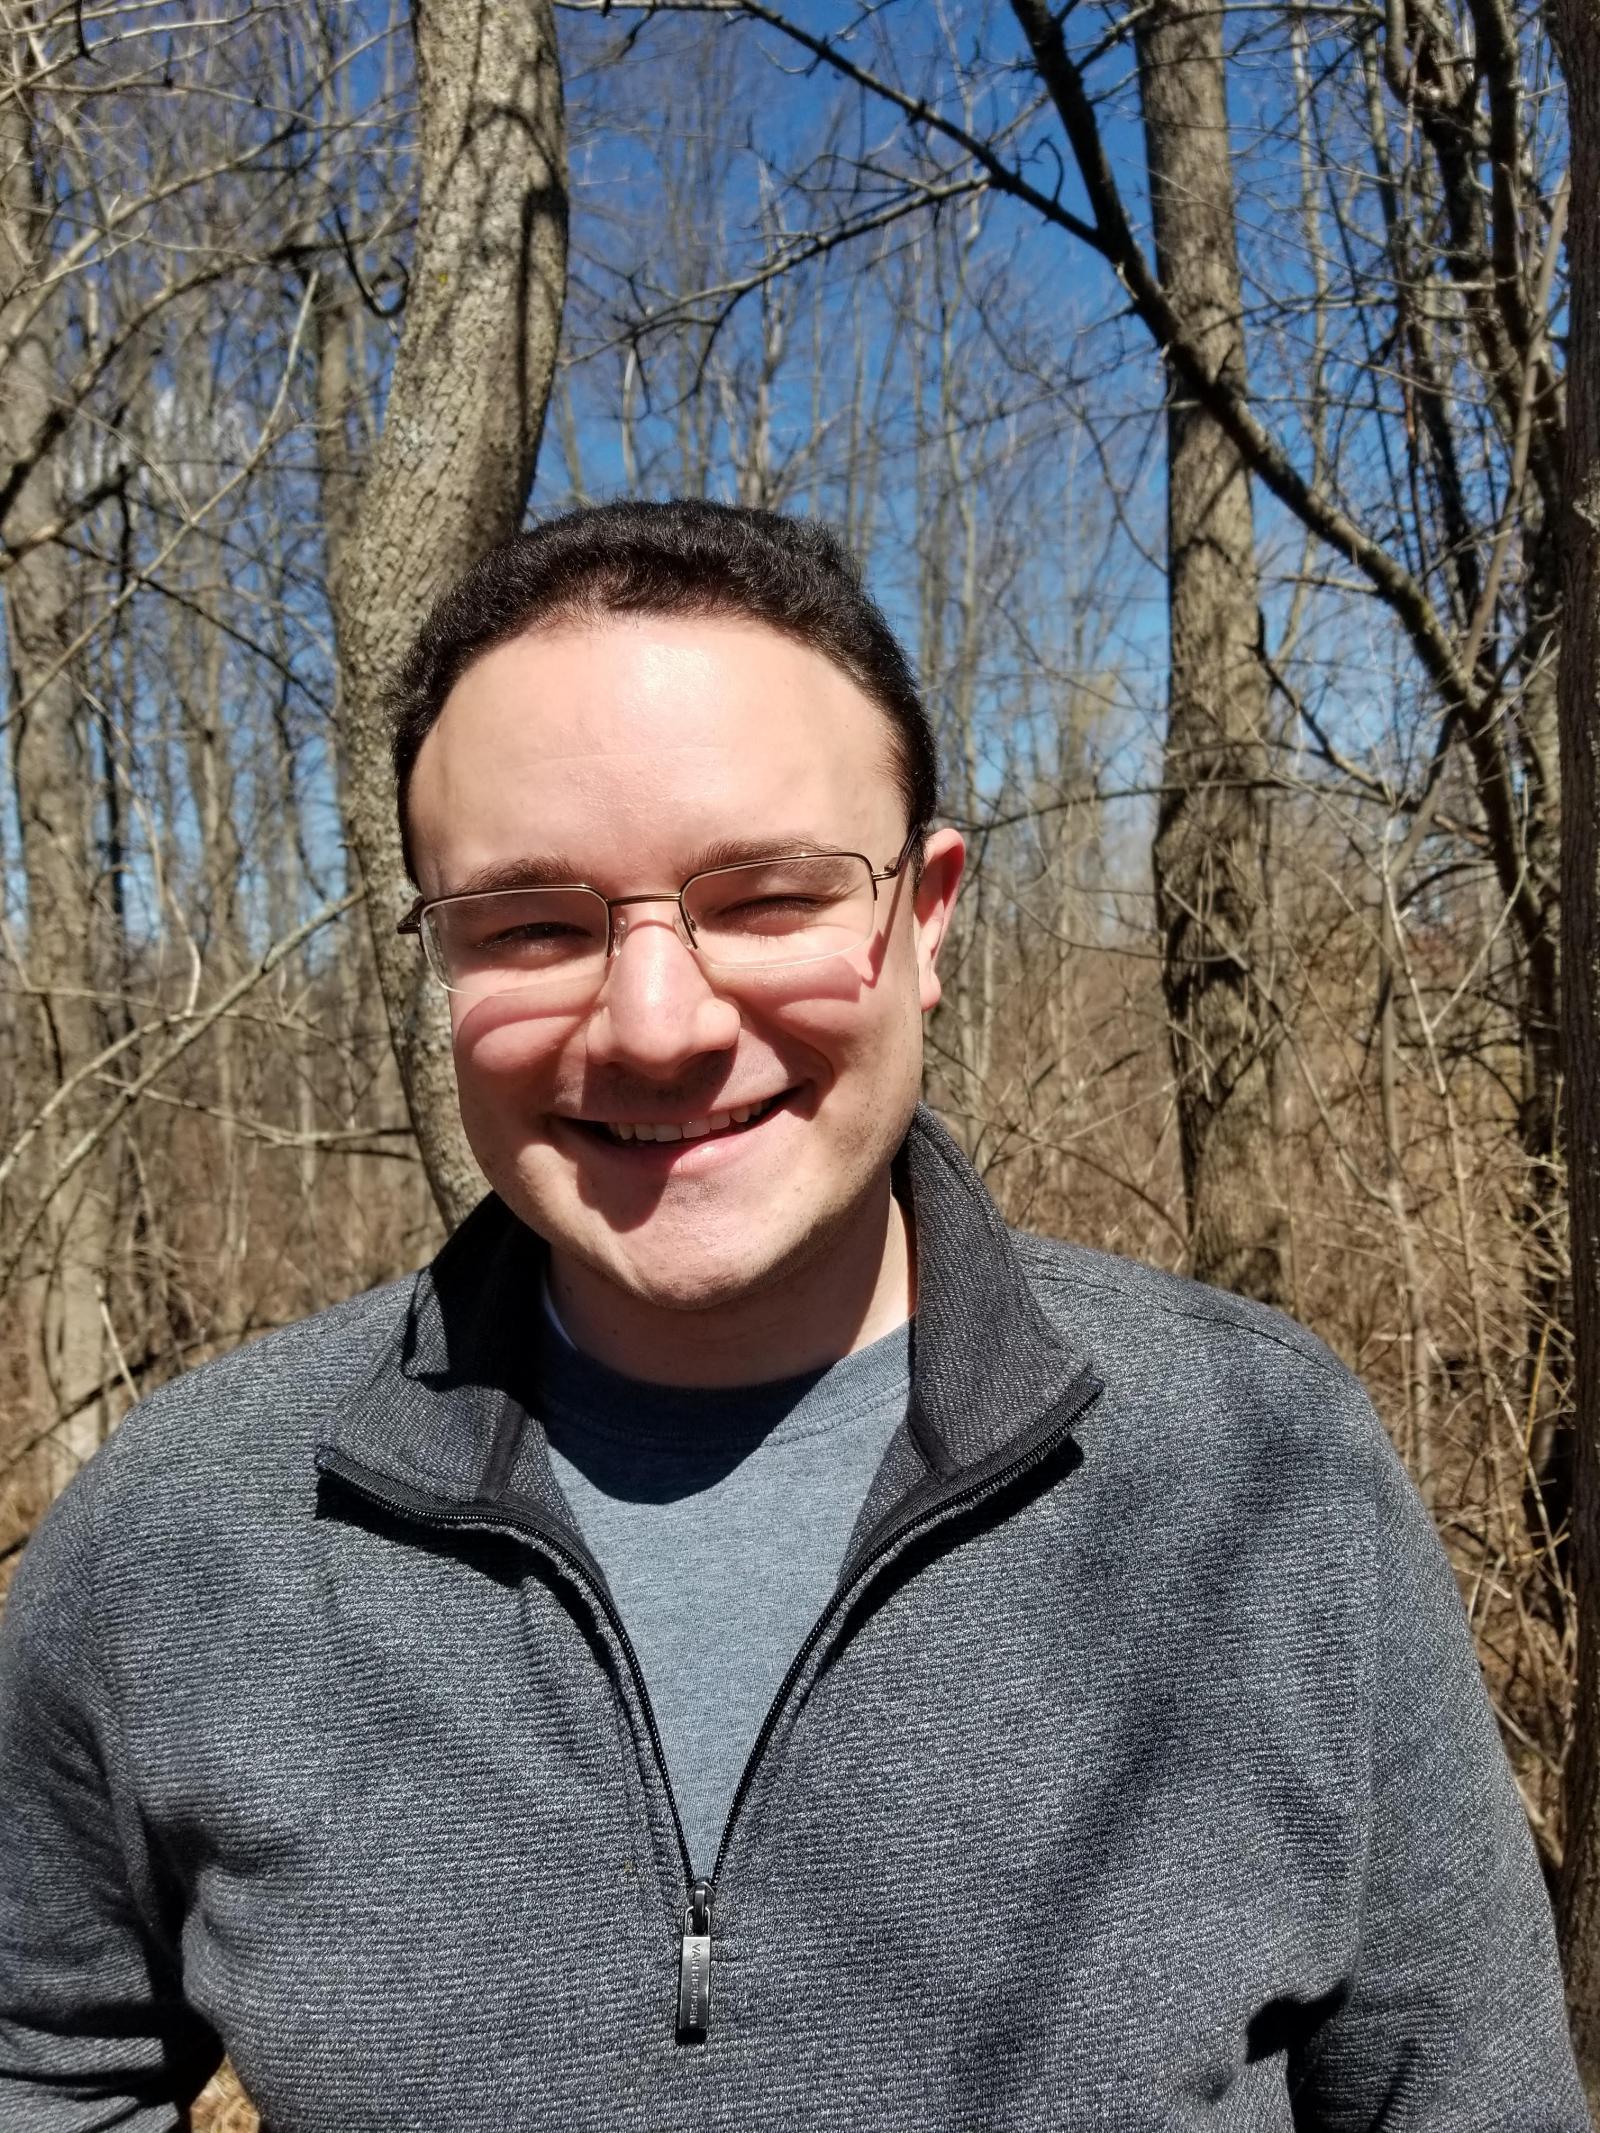 Michigan Life Sciences Fellow Jacob Berv, Ph.D.